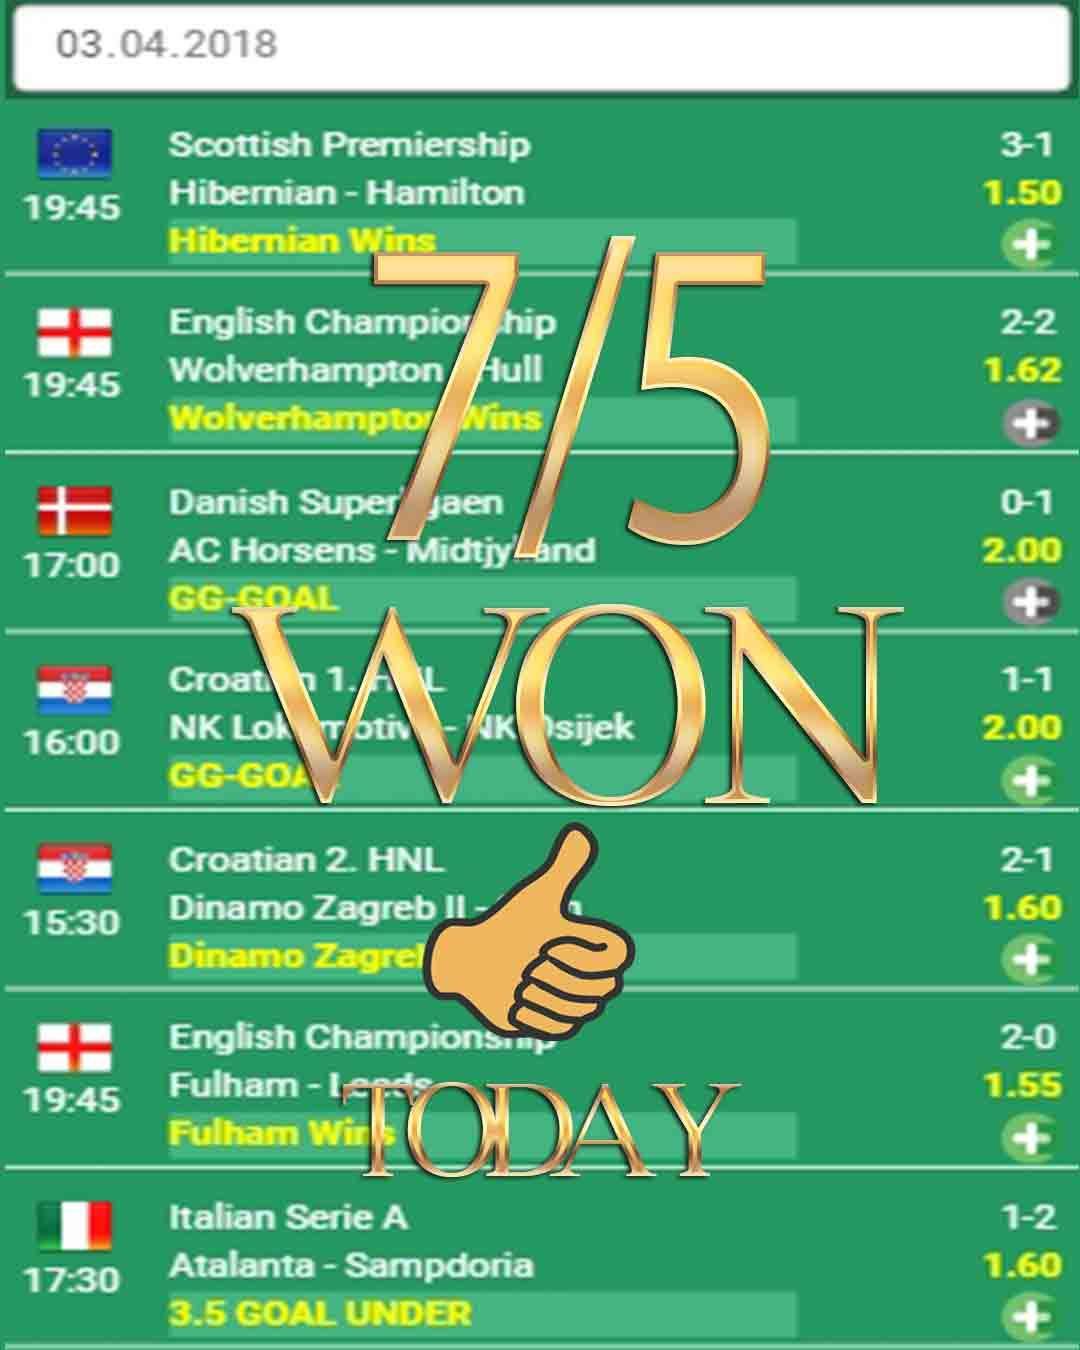 Vip betting odds 7/5 WON Bets analysis, Betsson